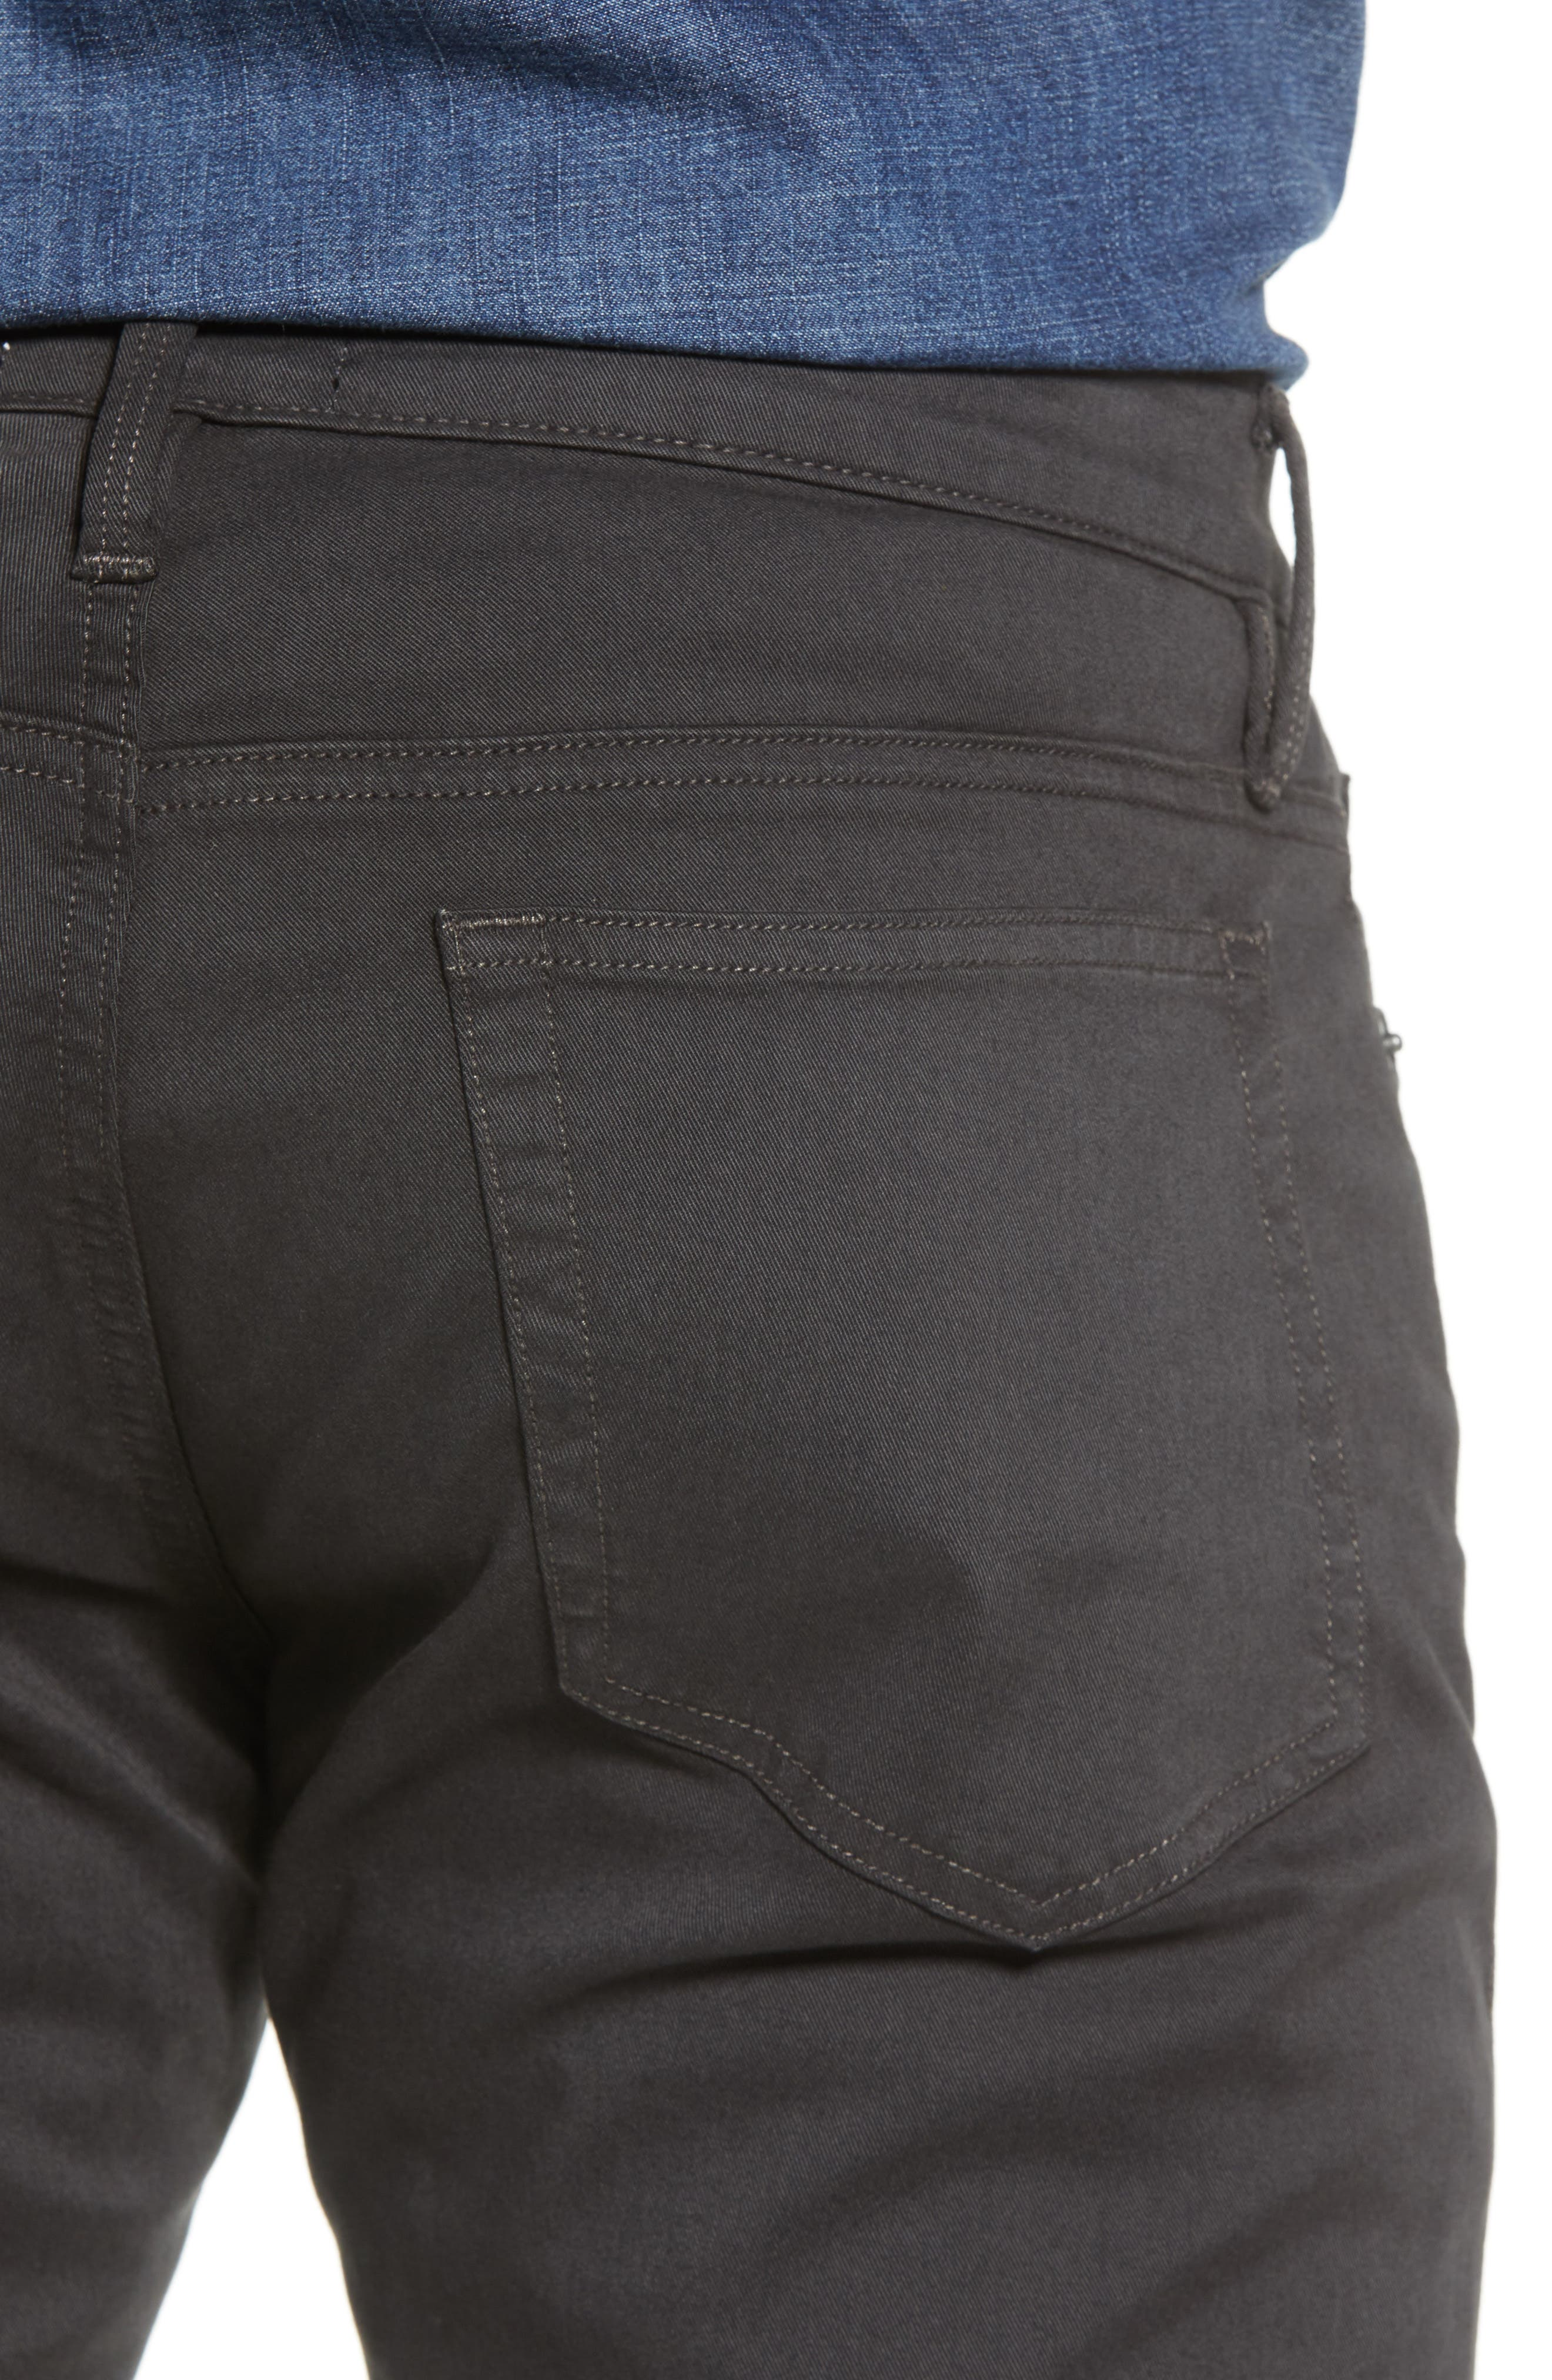 L'Homme Slim Fit Chino Pants,                             Alternate thumbnail 4, color,                             HEMATITE